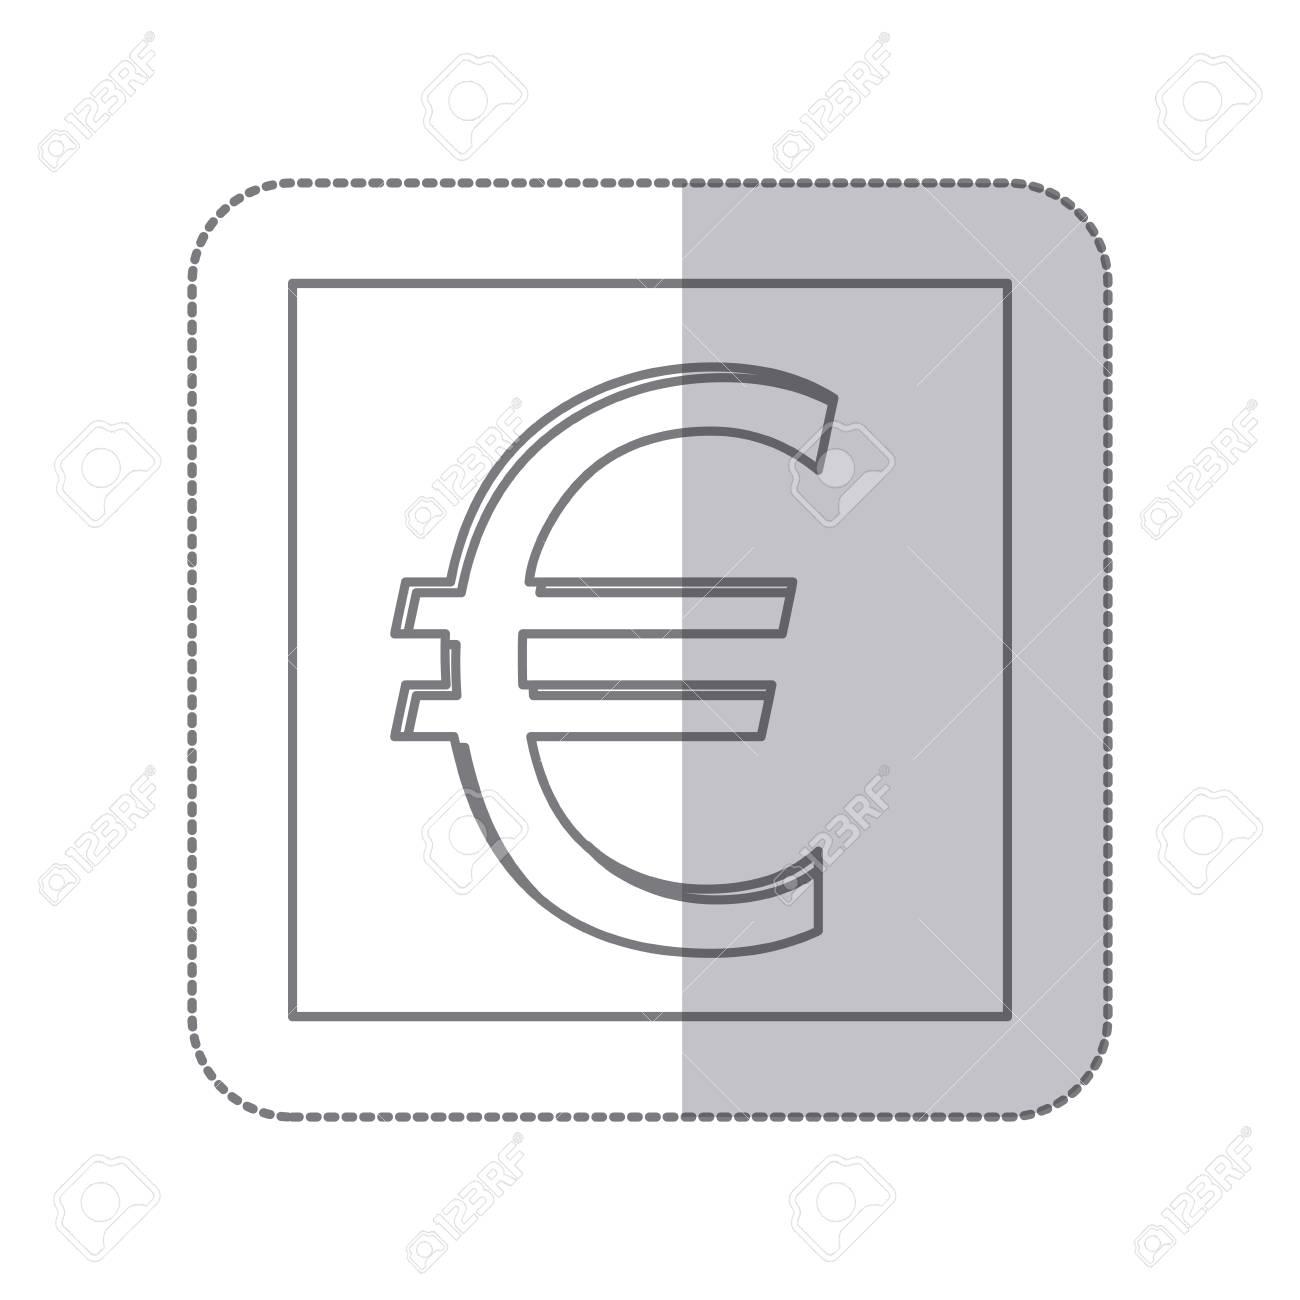 Beste Meter Symbol Bilder - Die Besten Elektrischen Schaltplan-Ideen ...